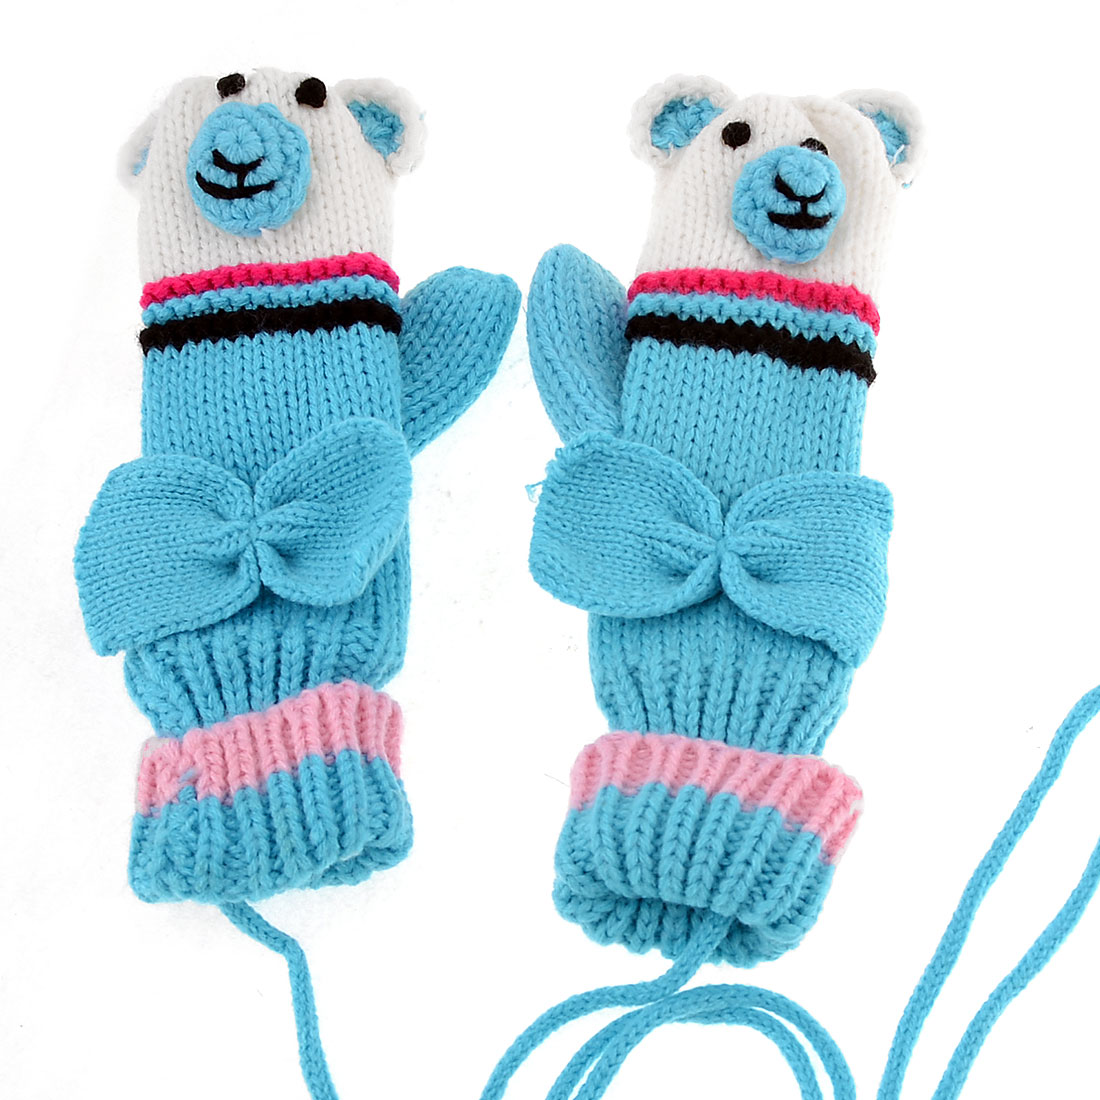 Lady Cartoon Design Bowknot Detail Knitted Hang Neck Mitten Gloves Blue Pair